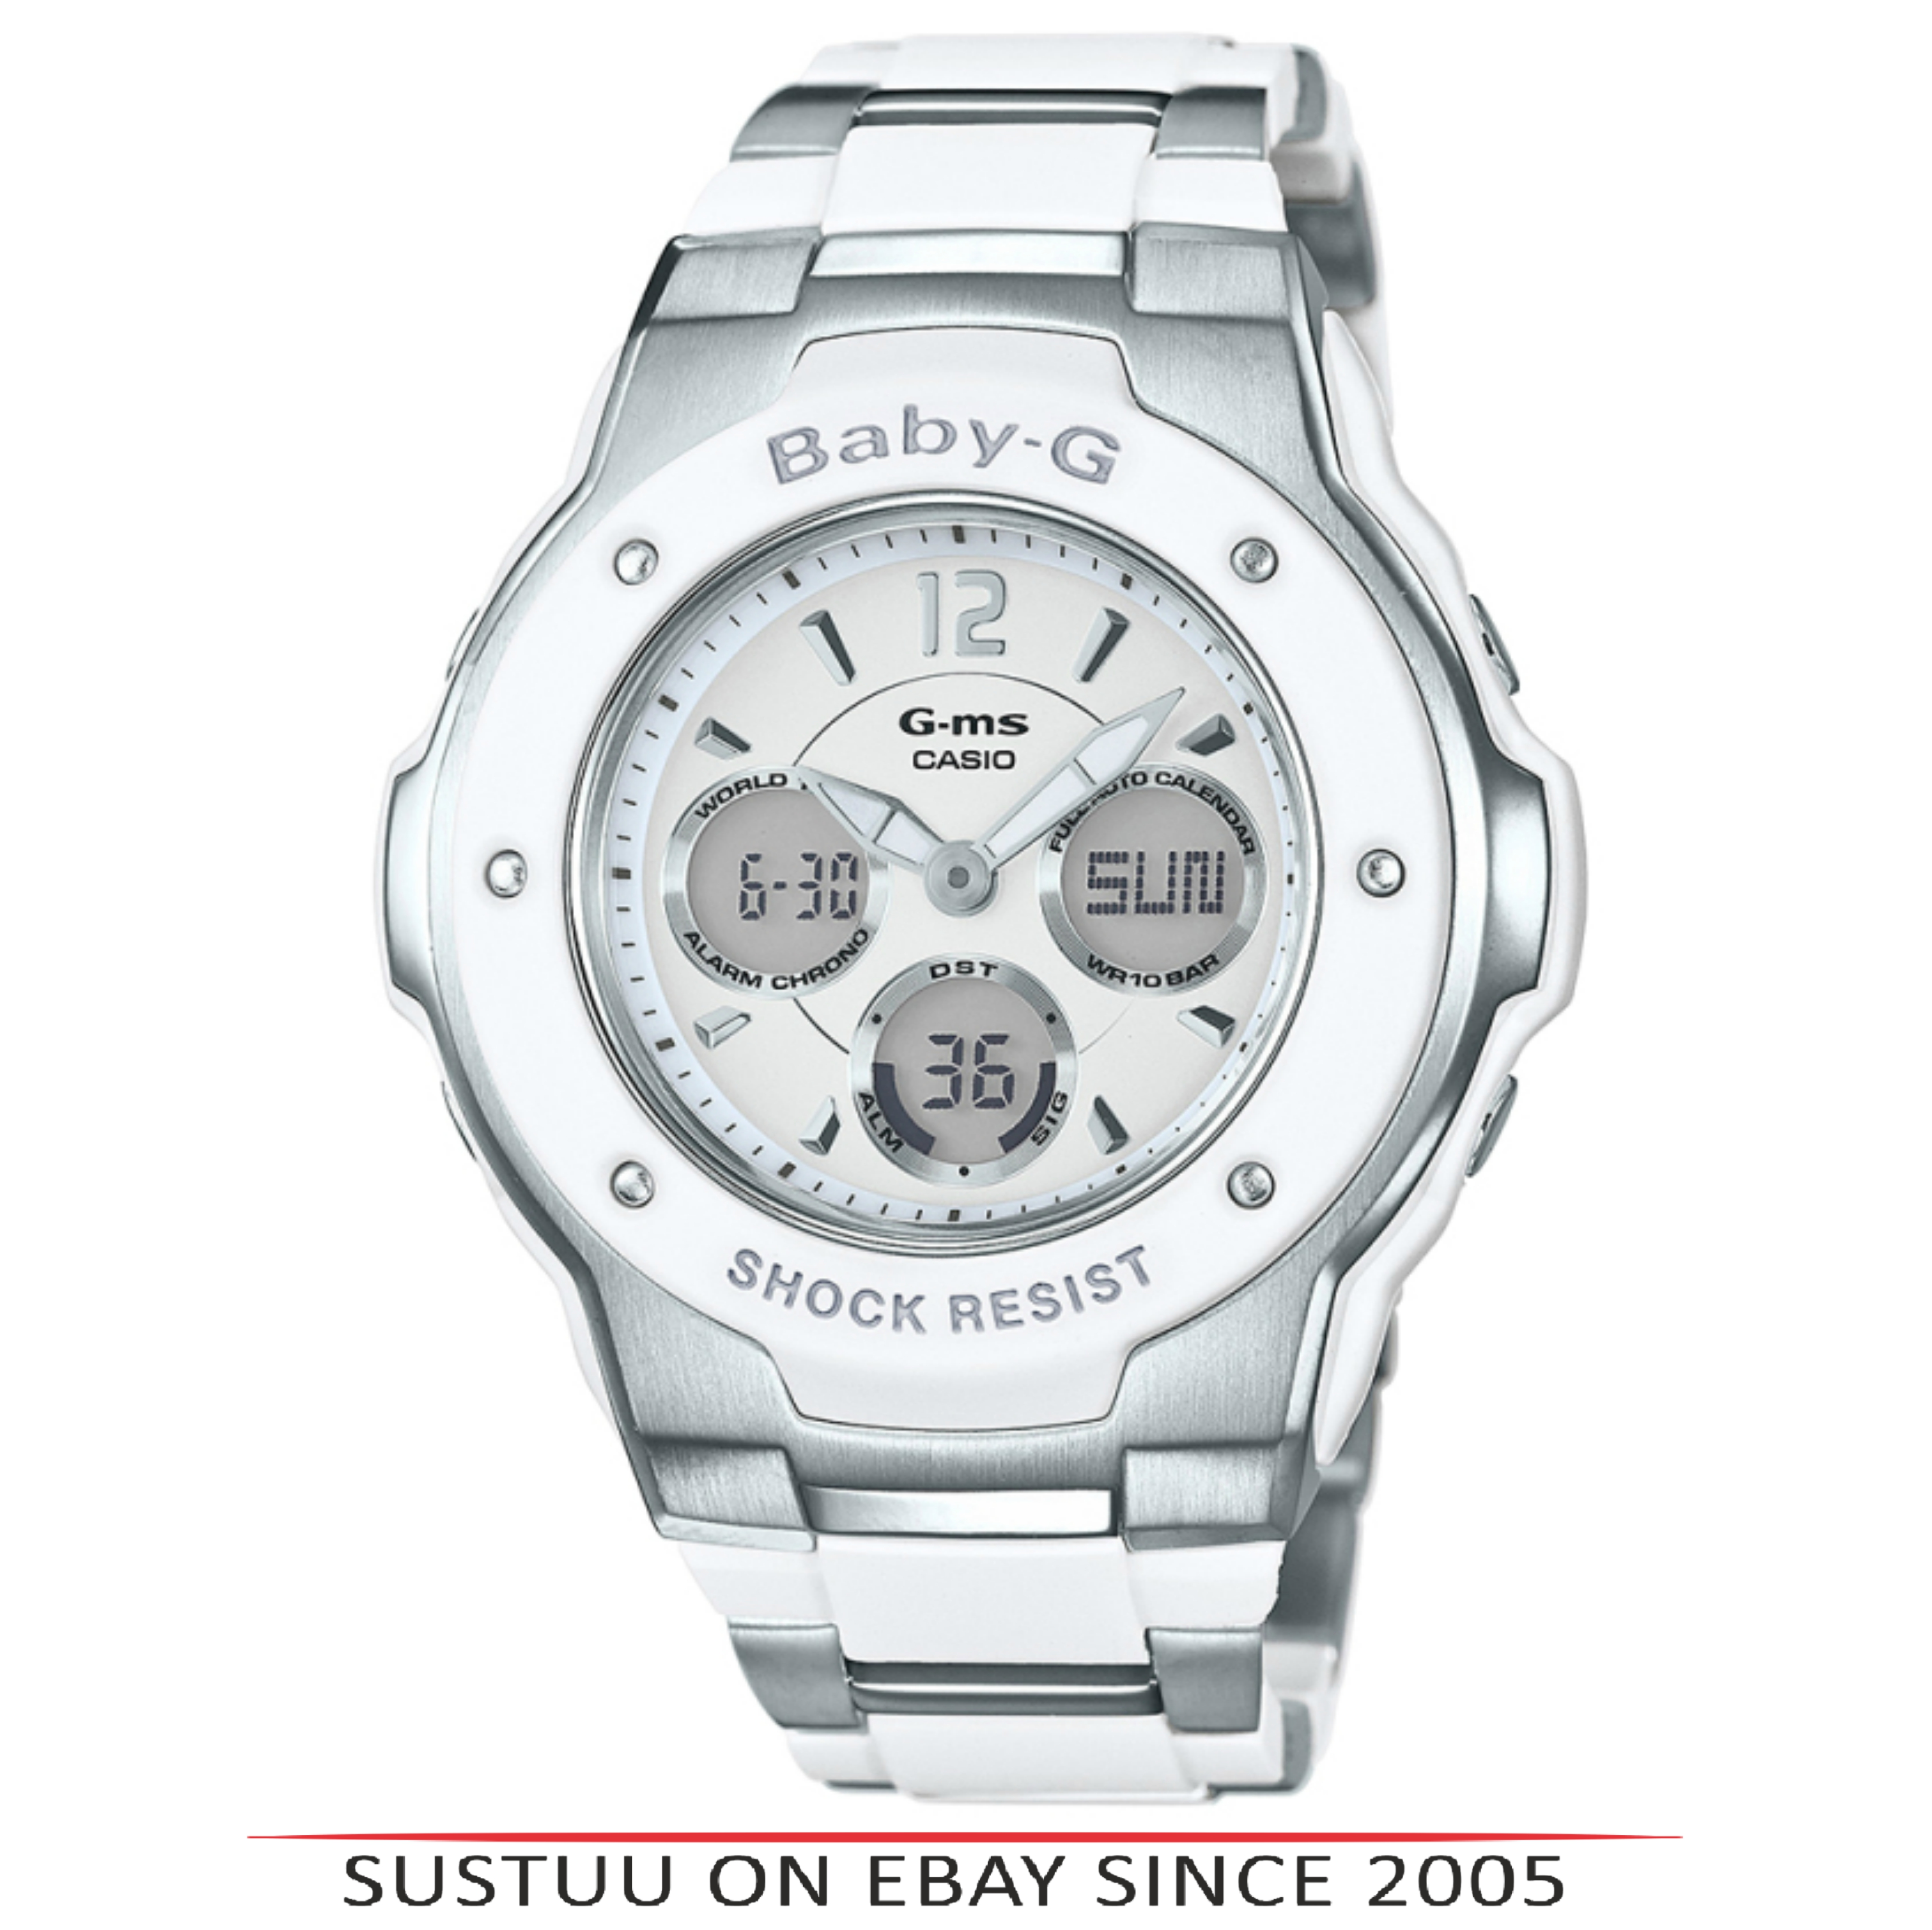 b2cc8c3b4d955 Sentinel Casio MSG300C-7B3ER Baby-G Digital Chronograph Watch│Shock   Water  Resist│